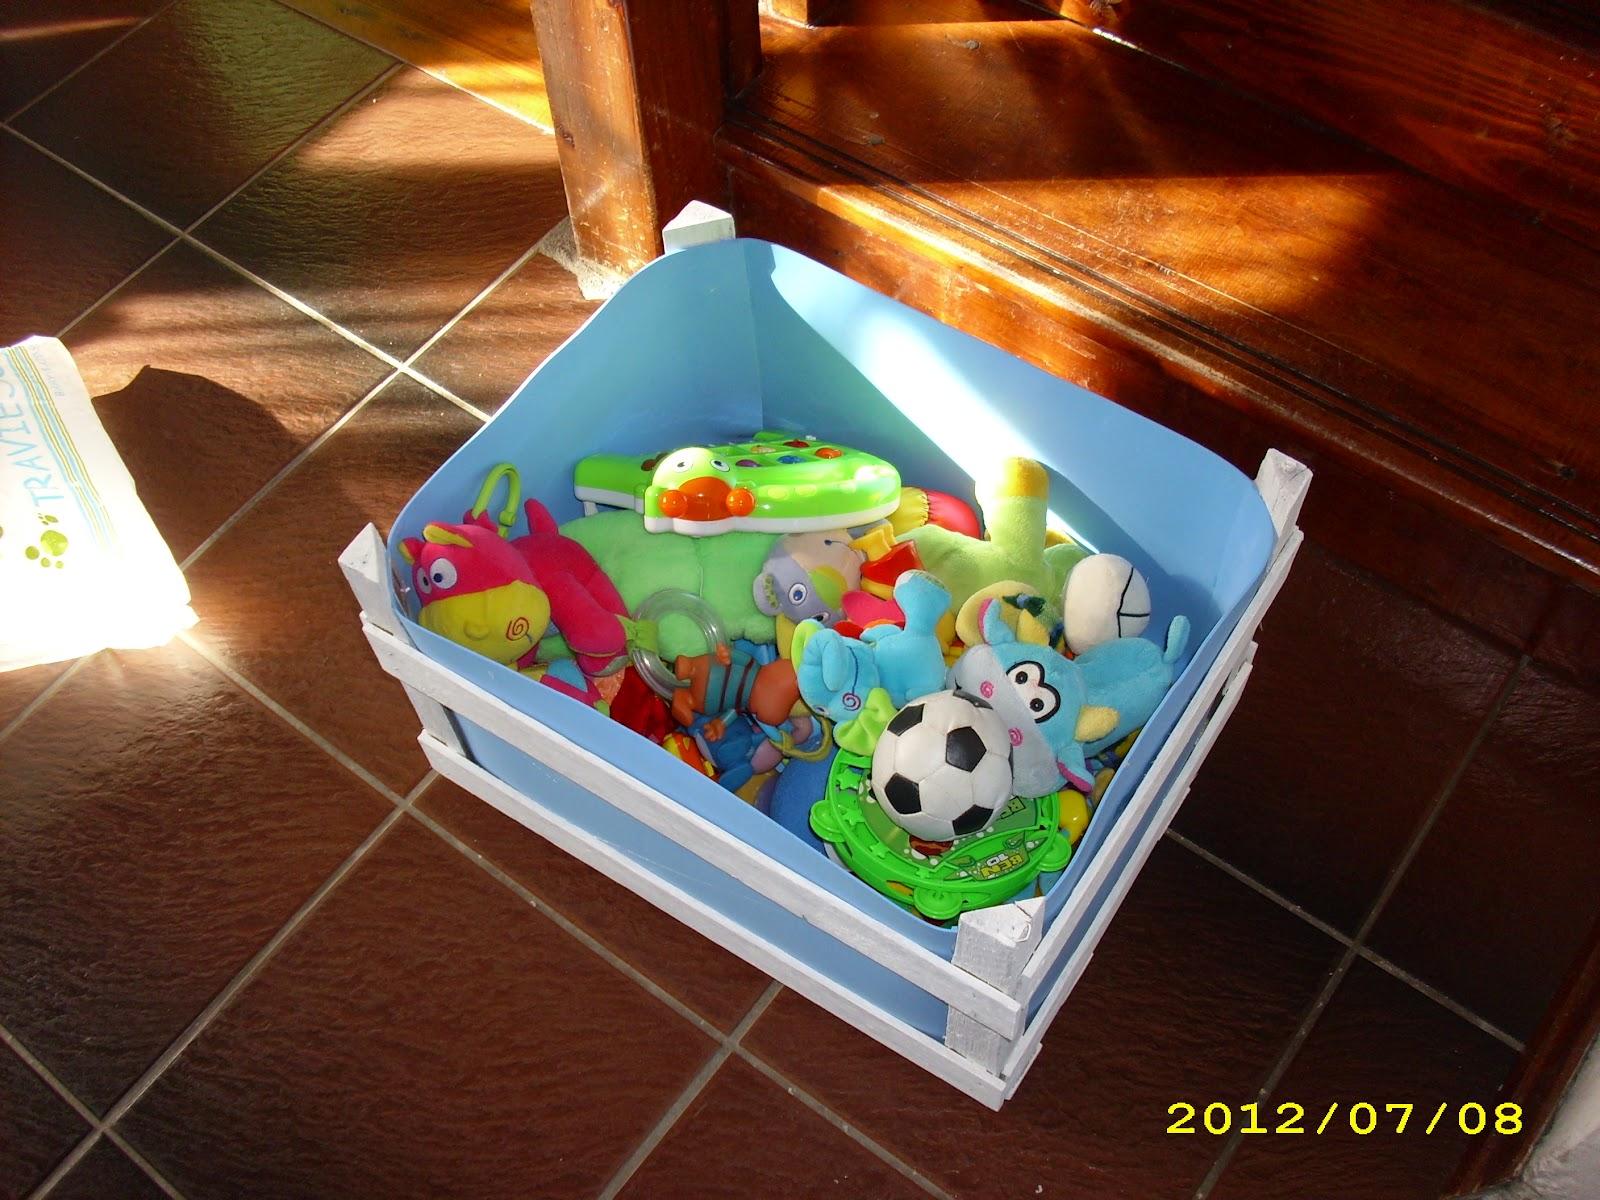 El taller de sof a reciclaje de un caj n de verduras - Cajon para juguetes ...